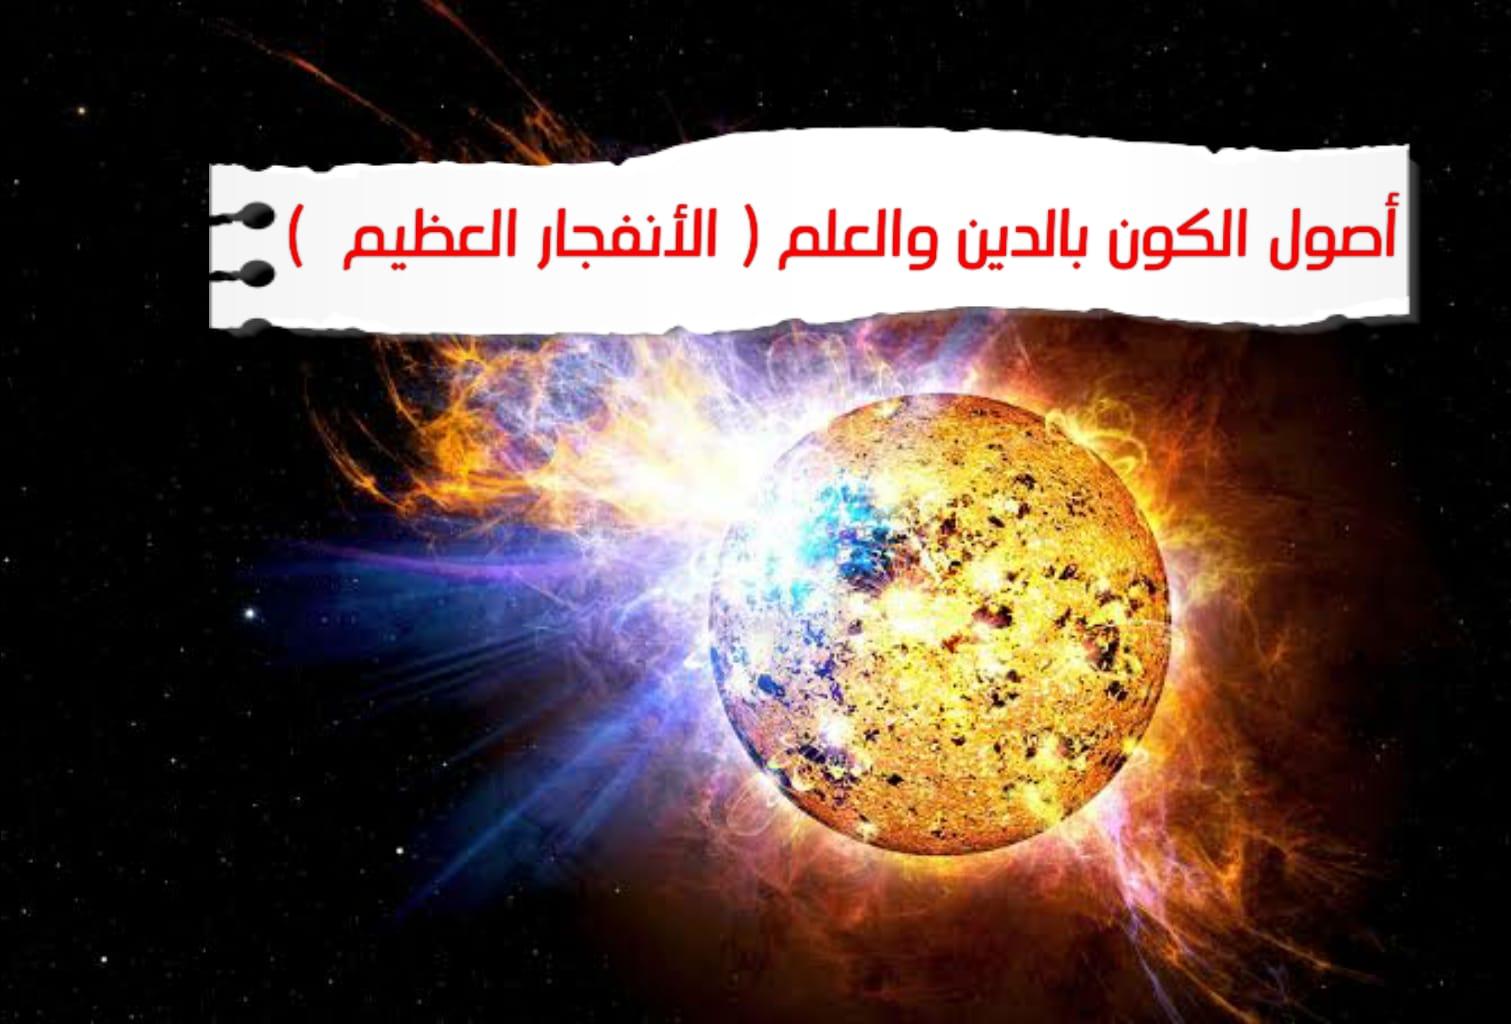 WhatsApp Image 2020 06 28 at 9.46.30 PM - أصول الكون - الدين والعلم ( الإنفجار العظيم )